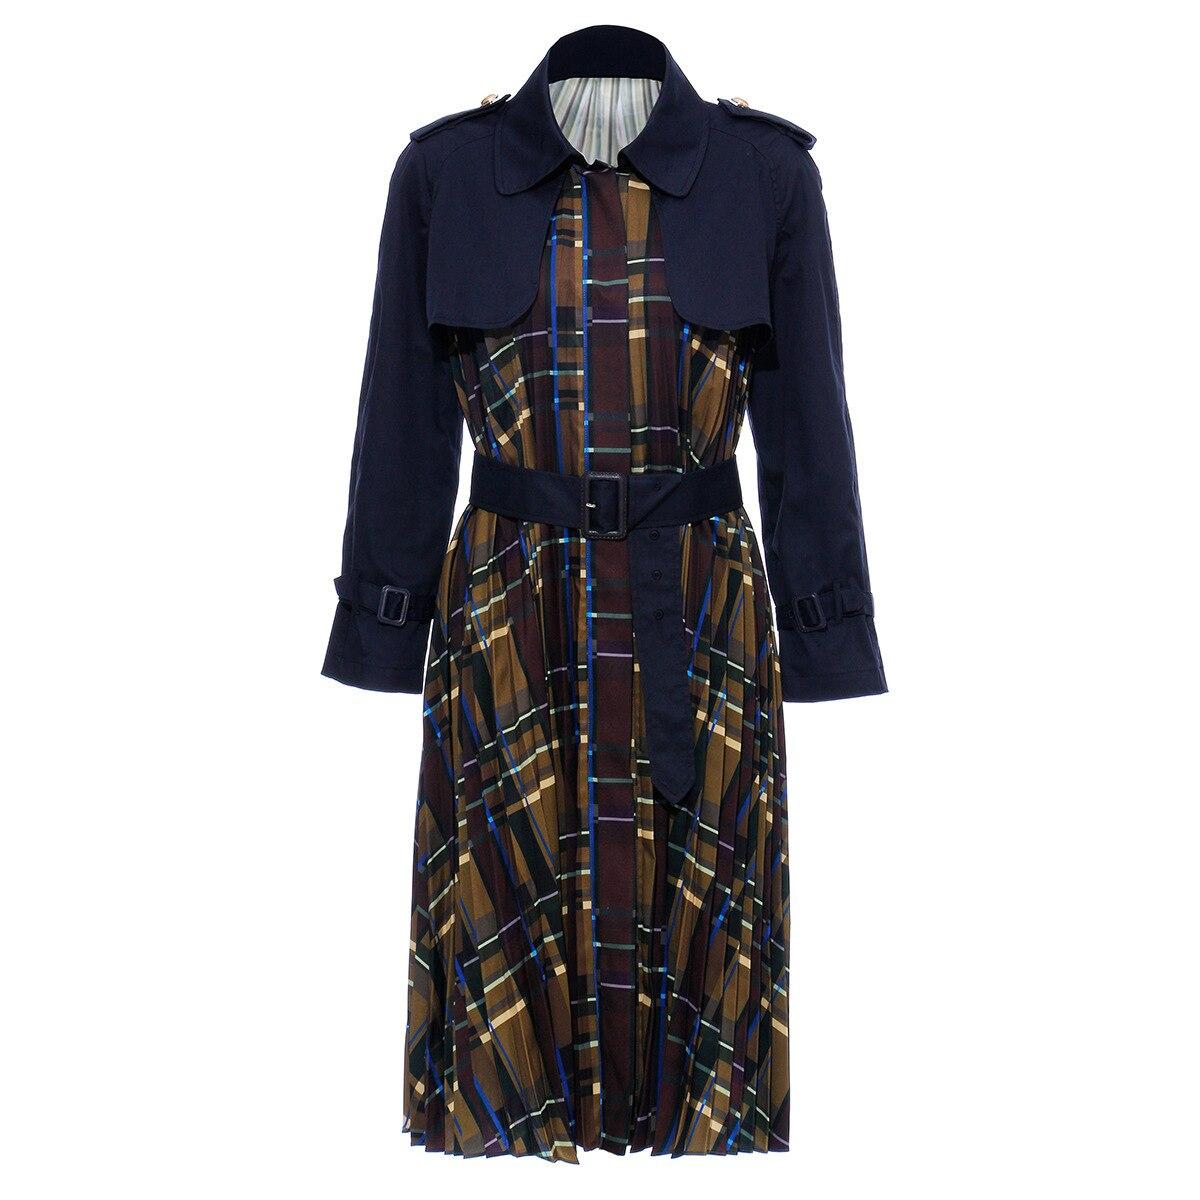 [EAM] Women Belt Pleated Hit Color Trench New Lapel Long Sleeve Loose Fit Windbreaker Fashion Tide Autumn Winter 19 1B096 5